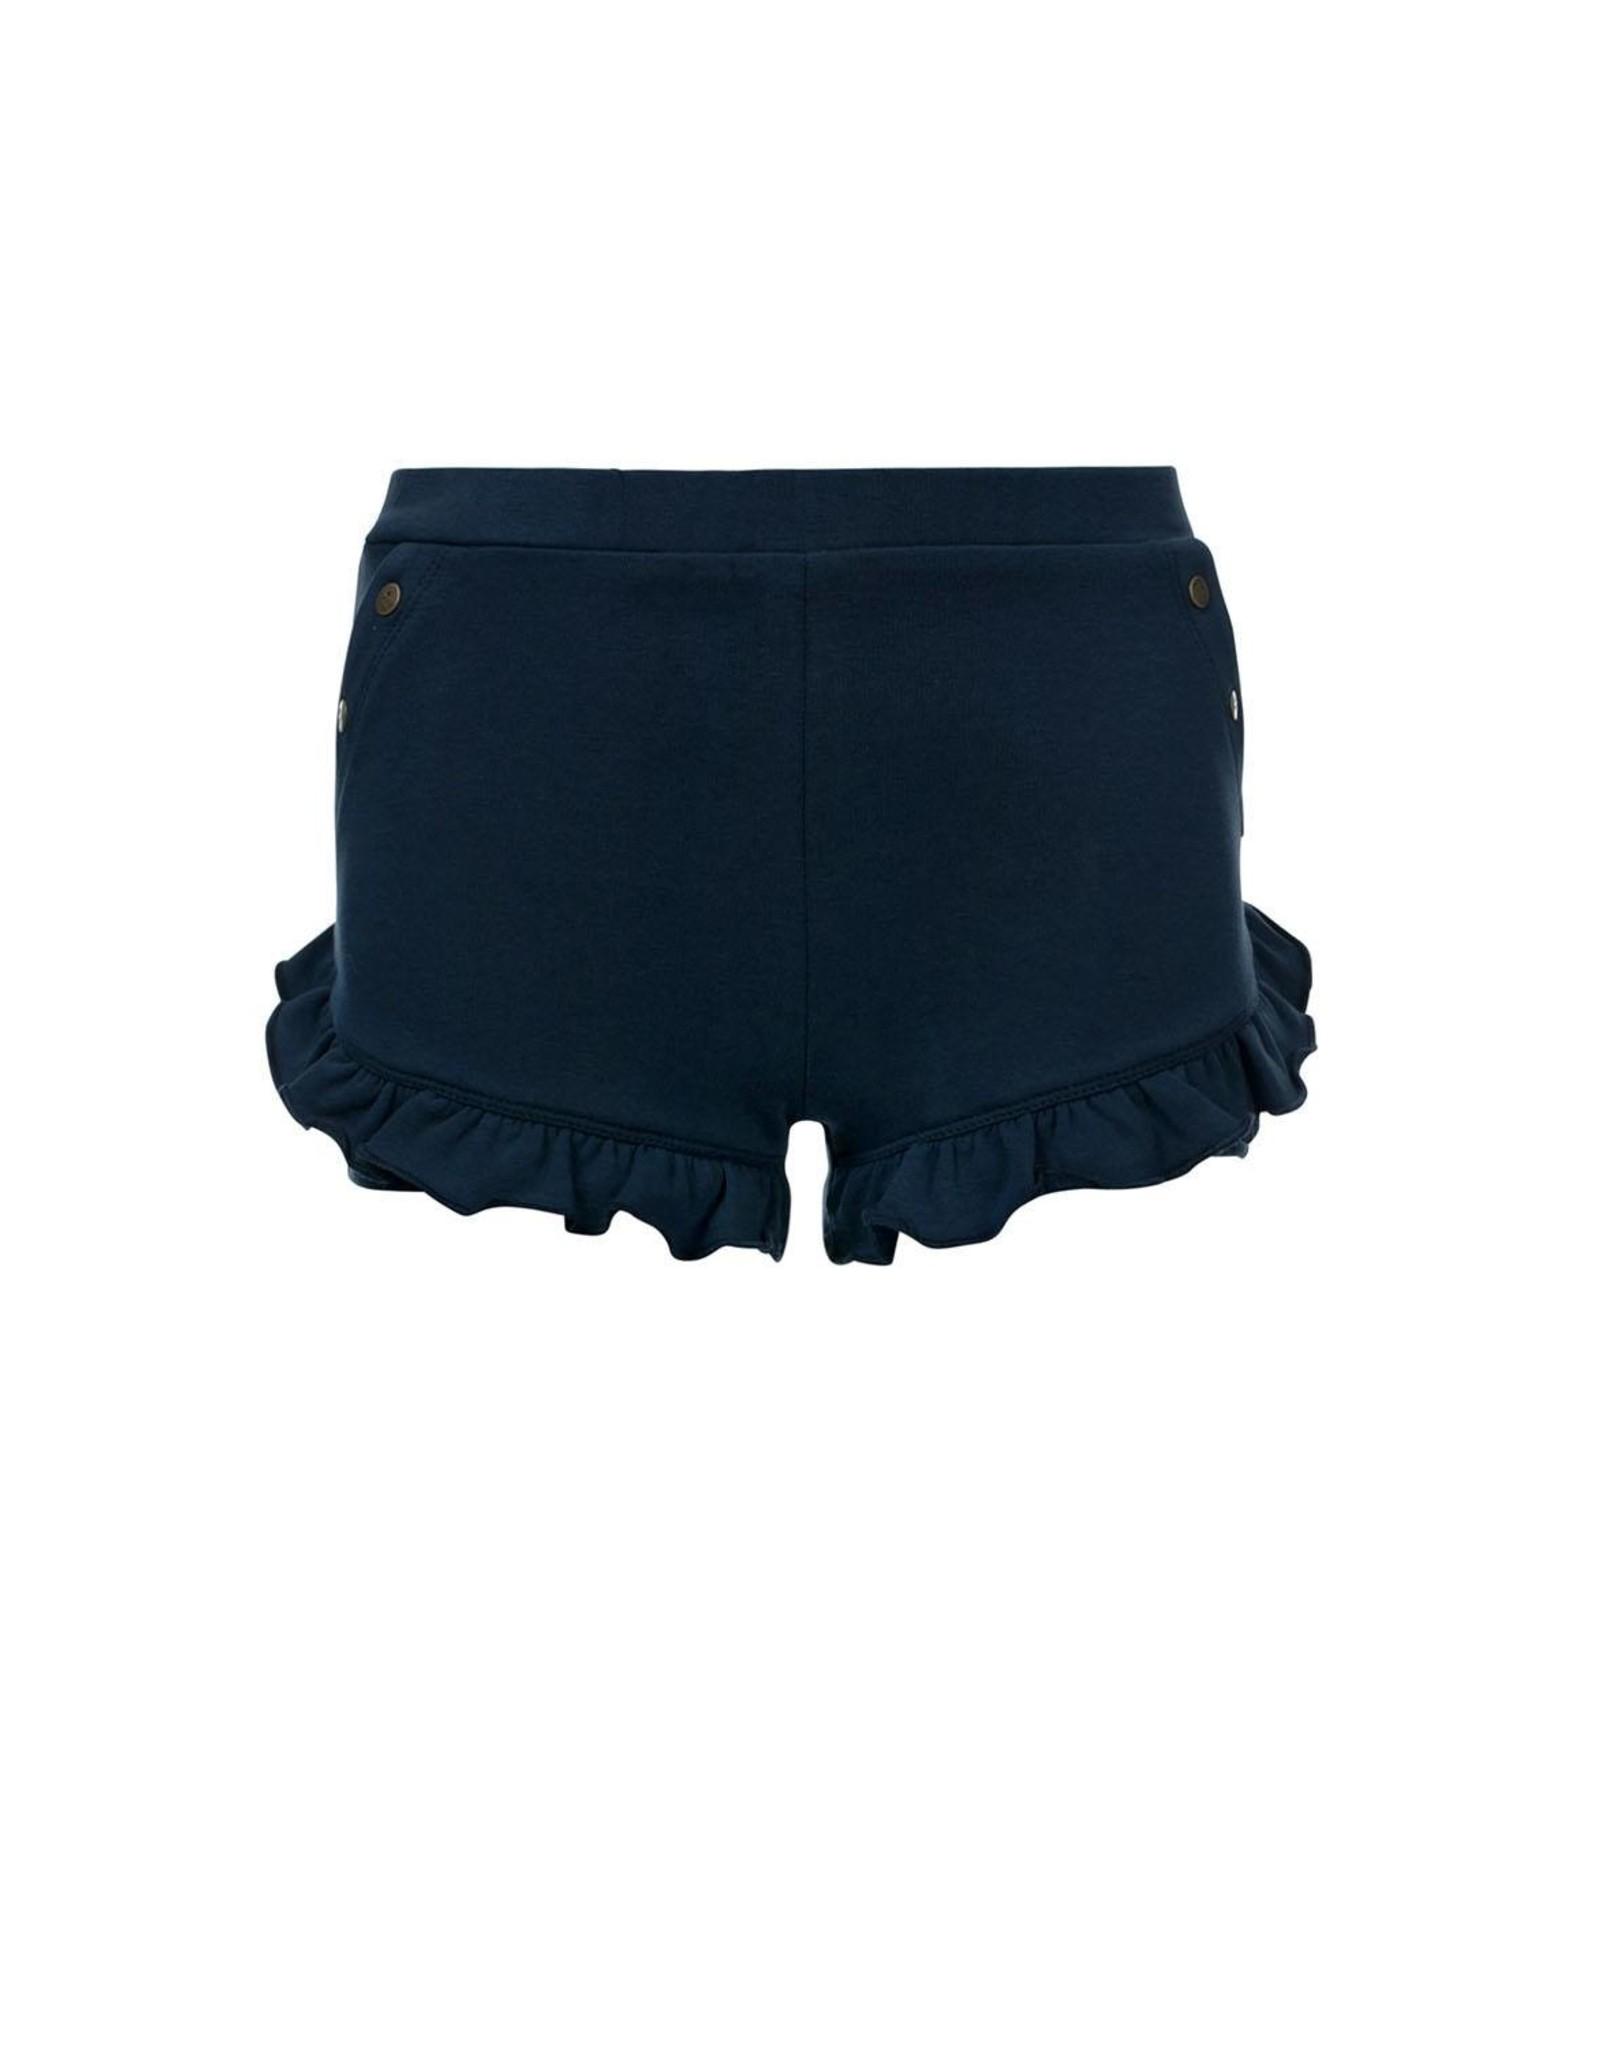 Looxs Little Little shorts indigo blue